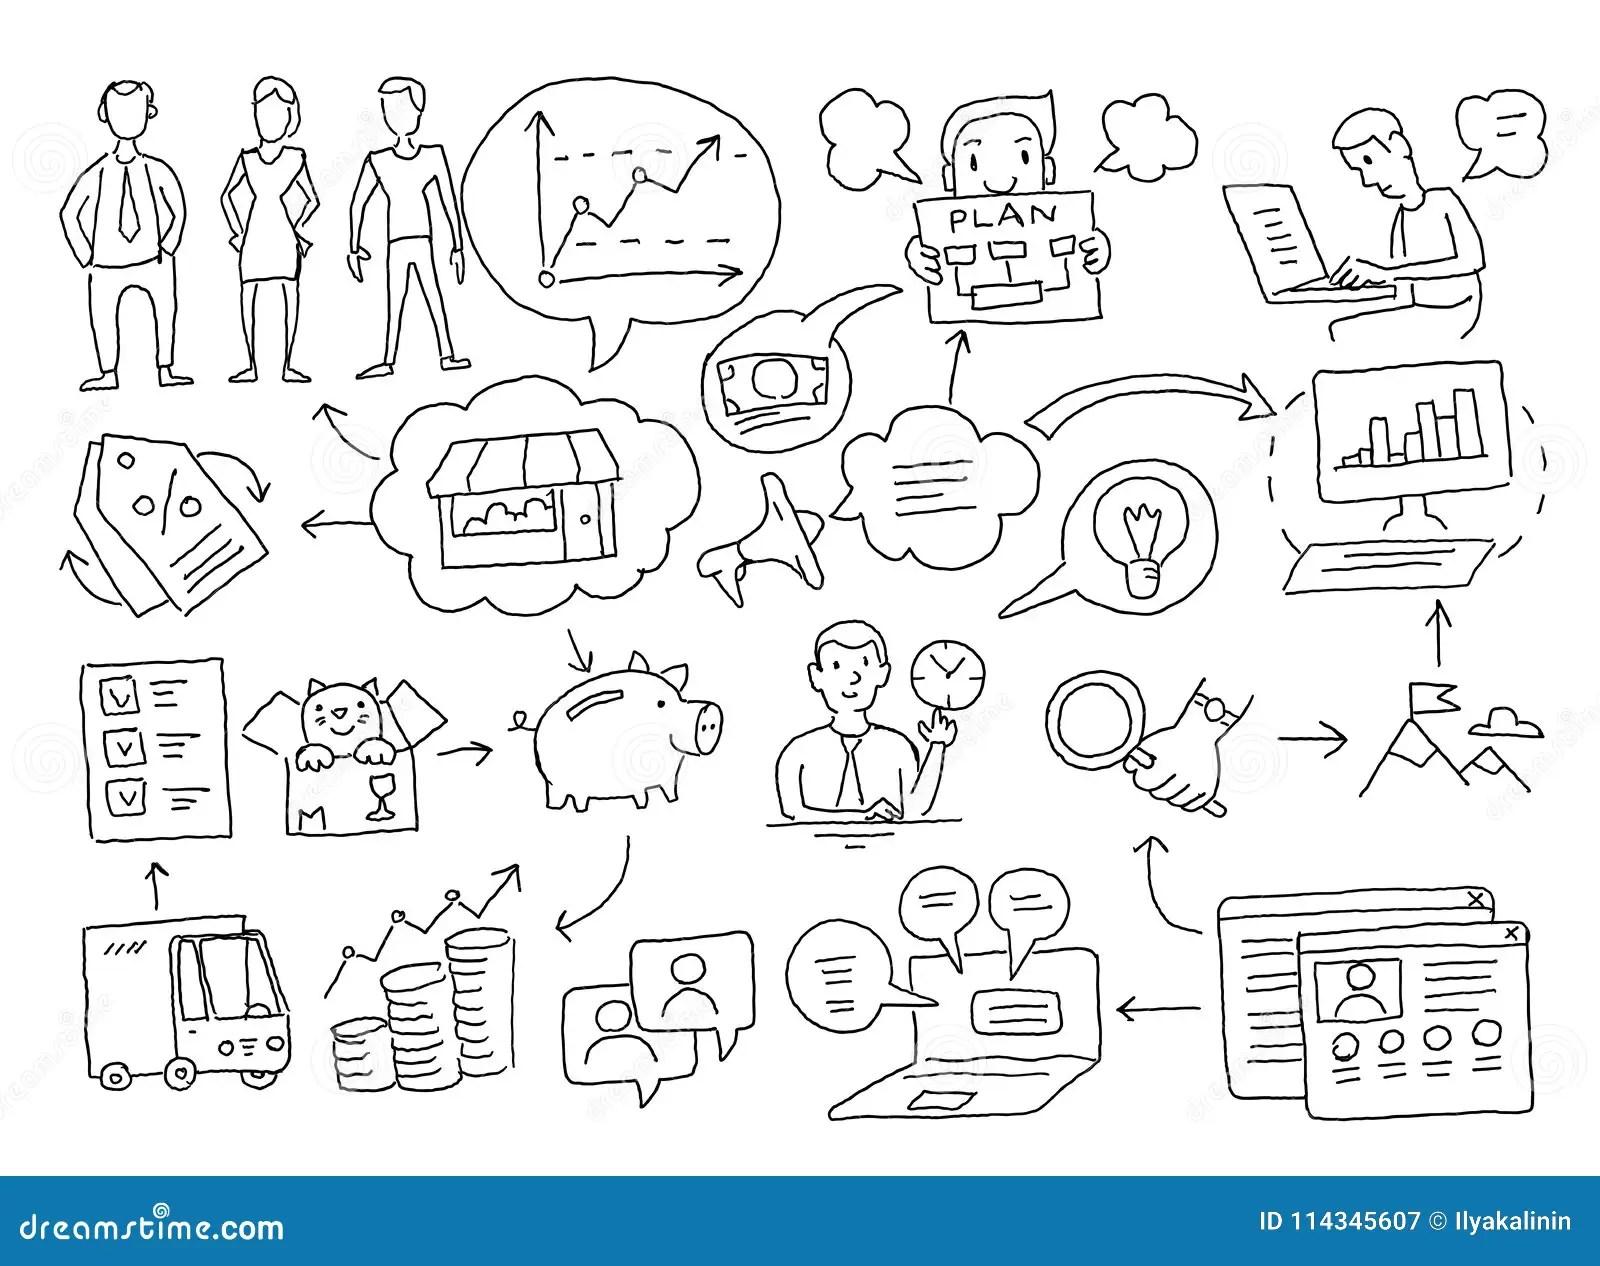 Sketch Diagram Of Cases. Business Plan Presentation